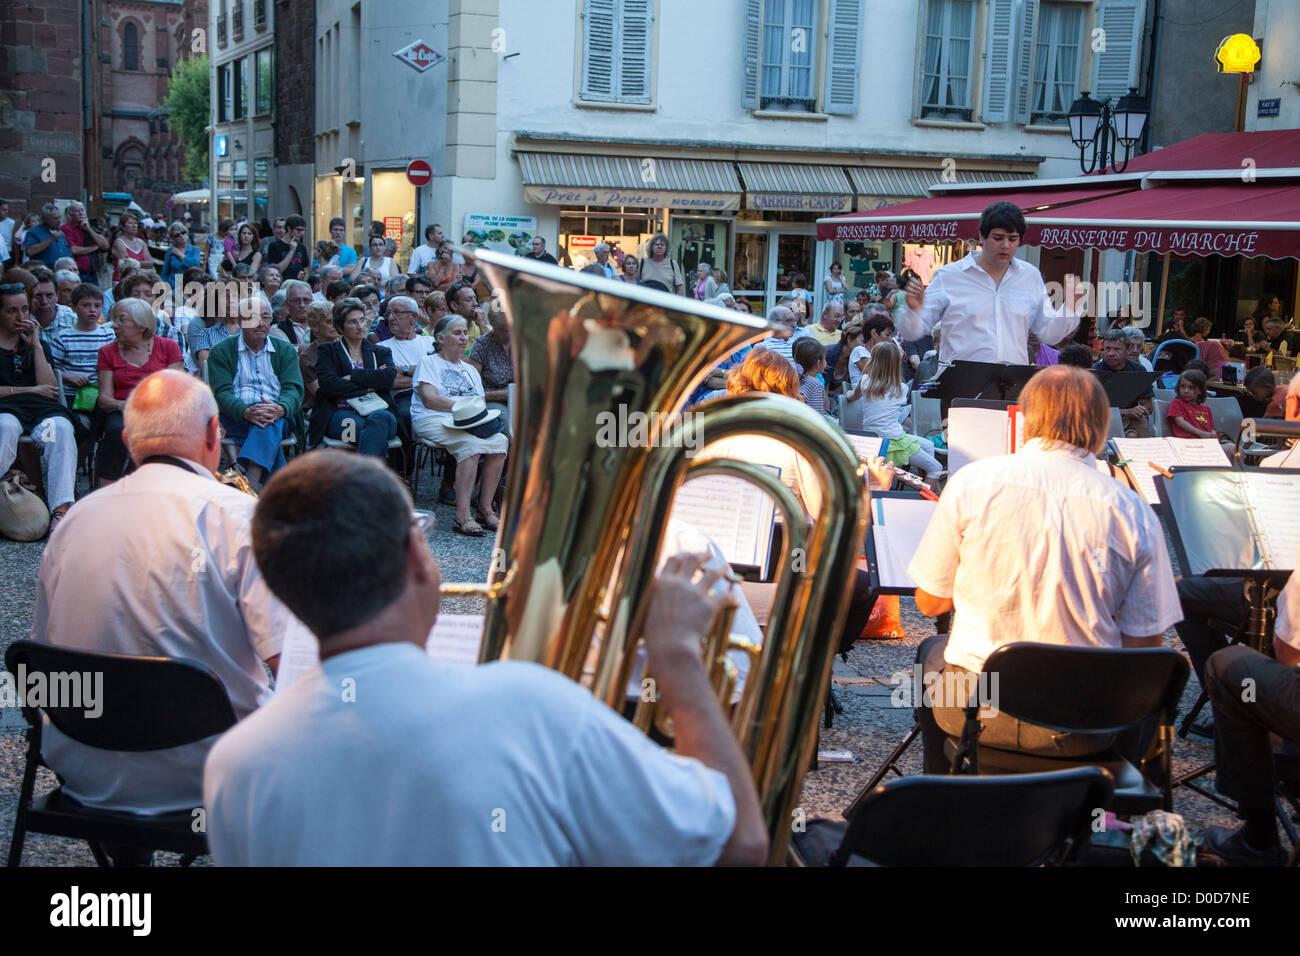 MUSICAL ENTERTAINMENT THE EVENING FARMER'S MARKET ESPALION AVEYRON (12) FRANCE - Stock Image